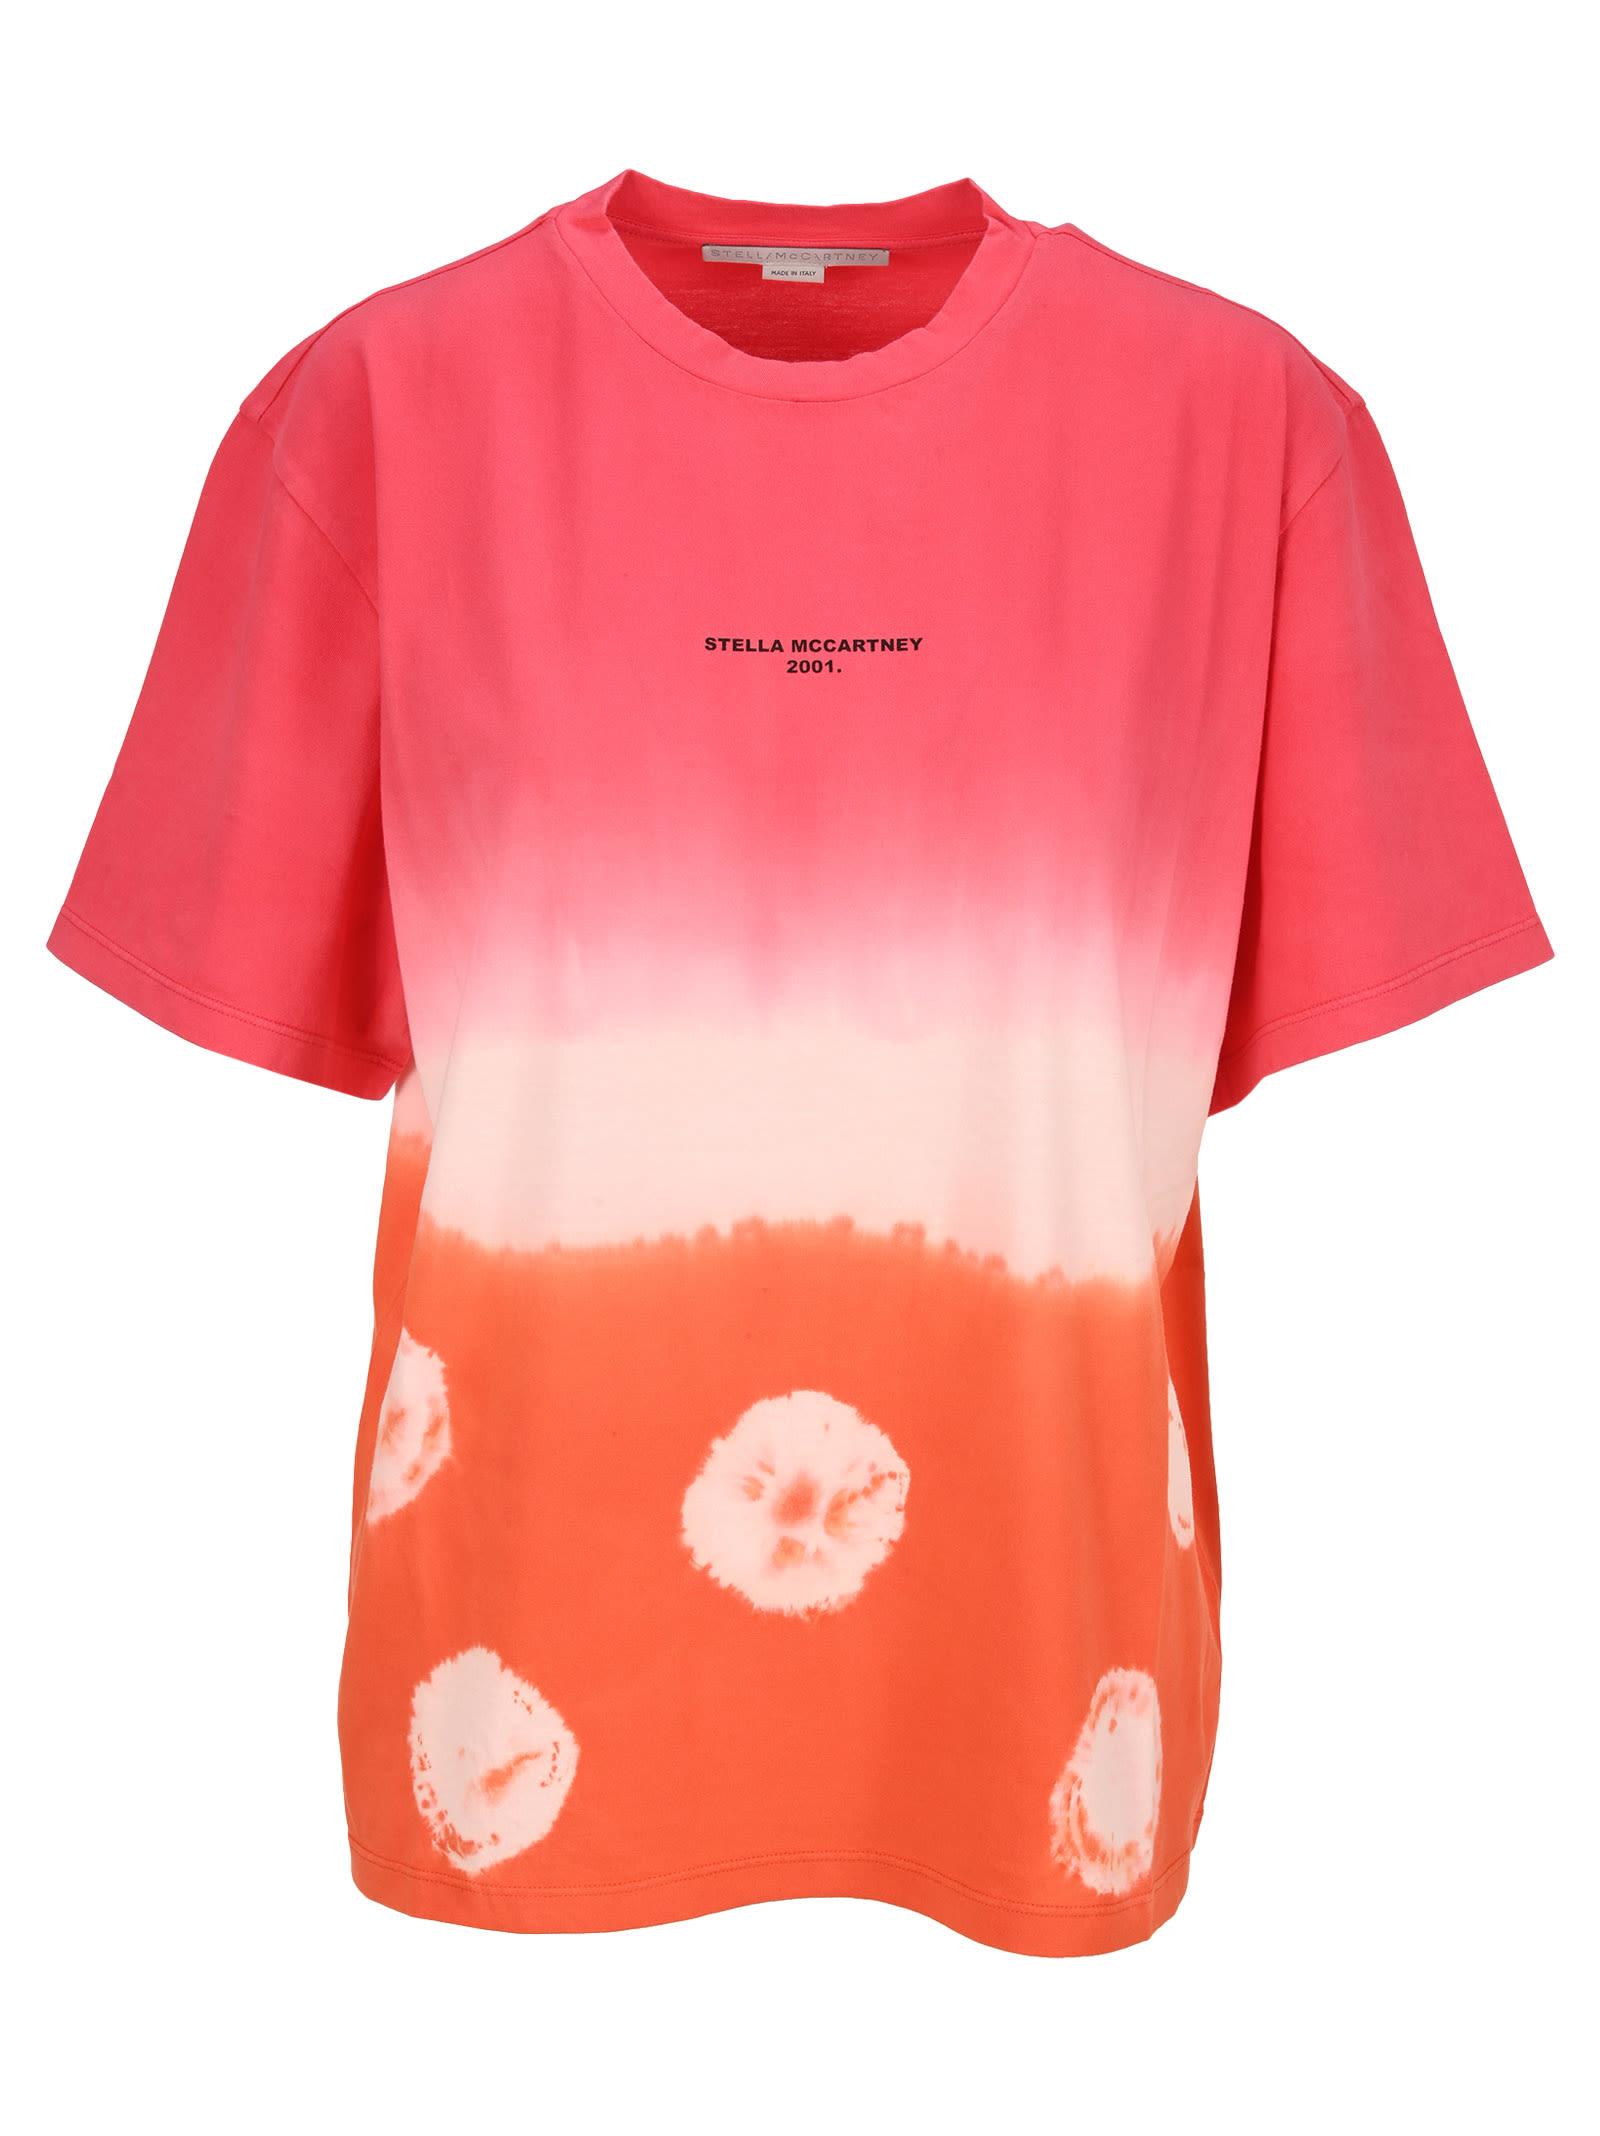 Stella Mccartney Gradient Tie-dye T-shirt